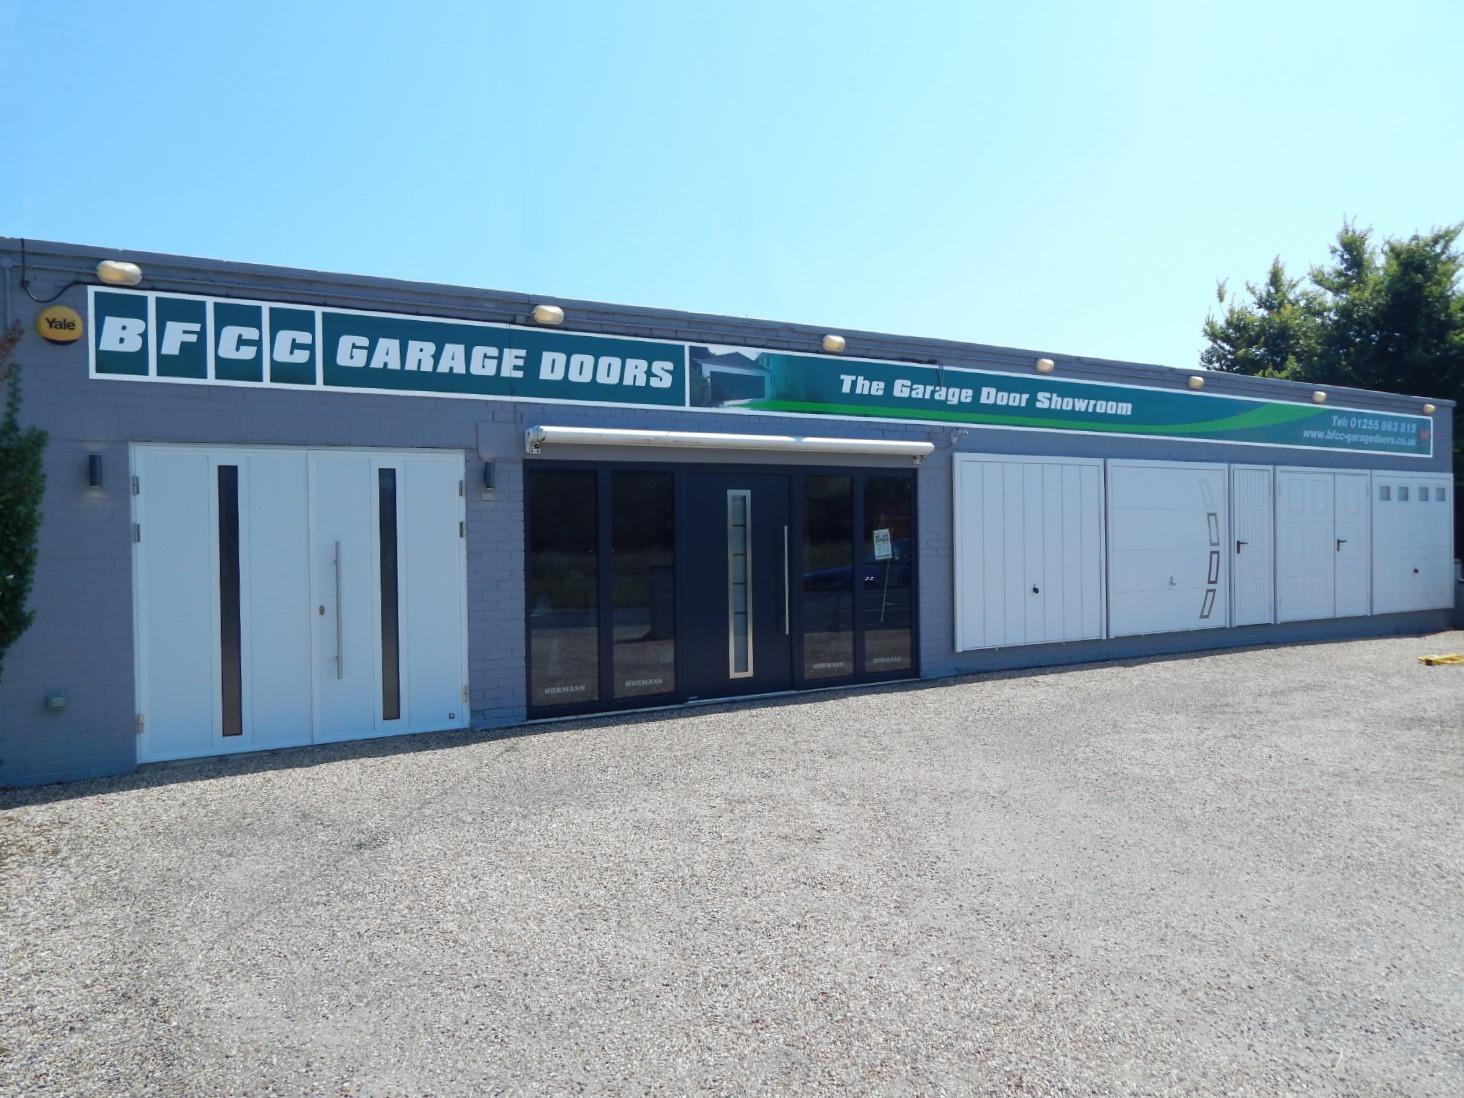 Bfcc Garage Doors Colchester Amp Clacton